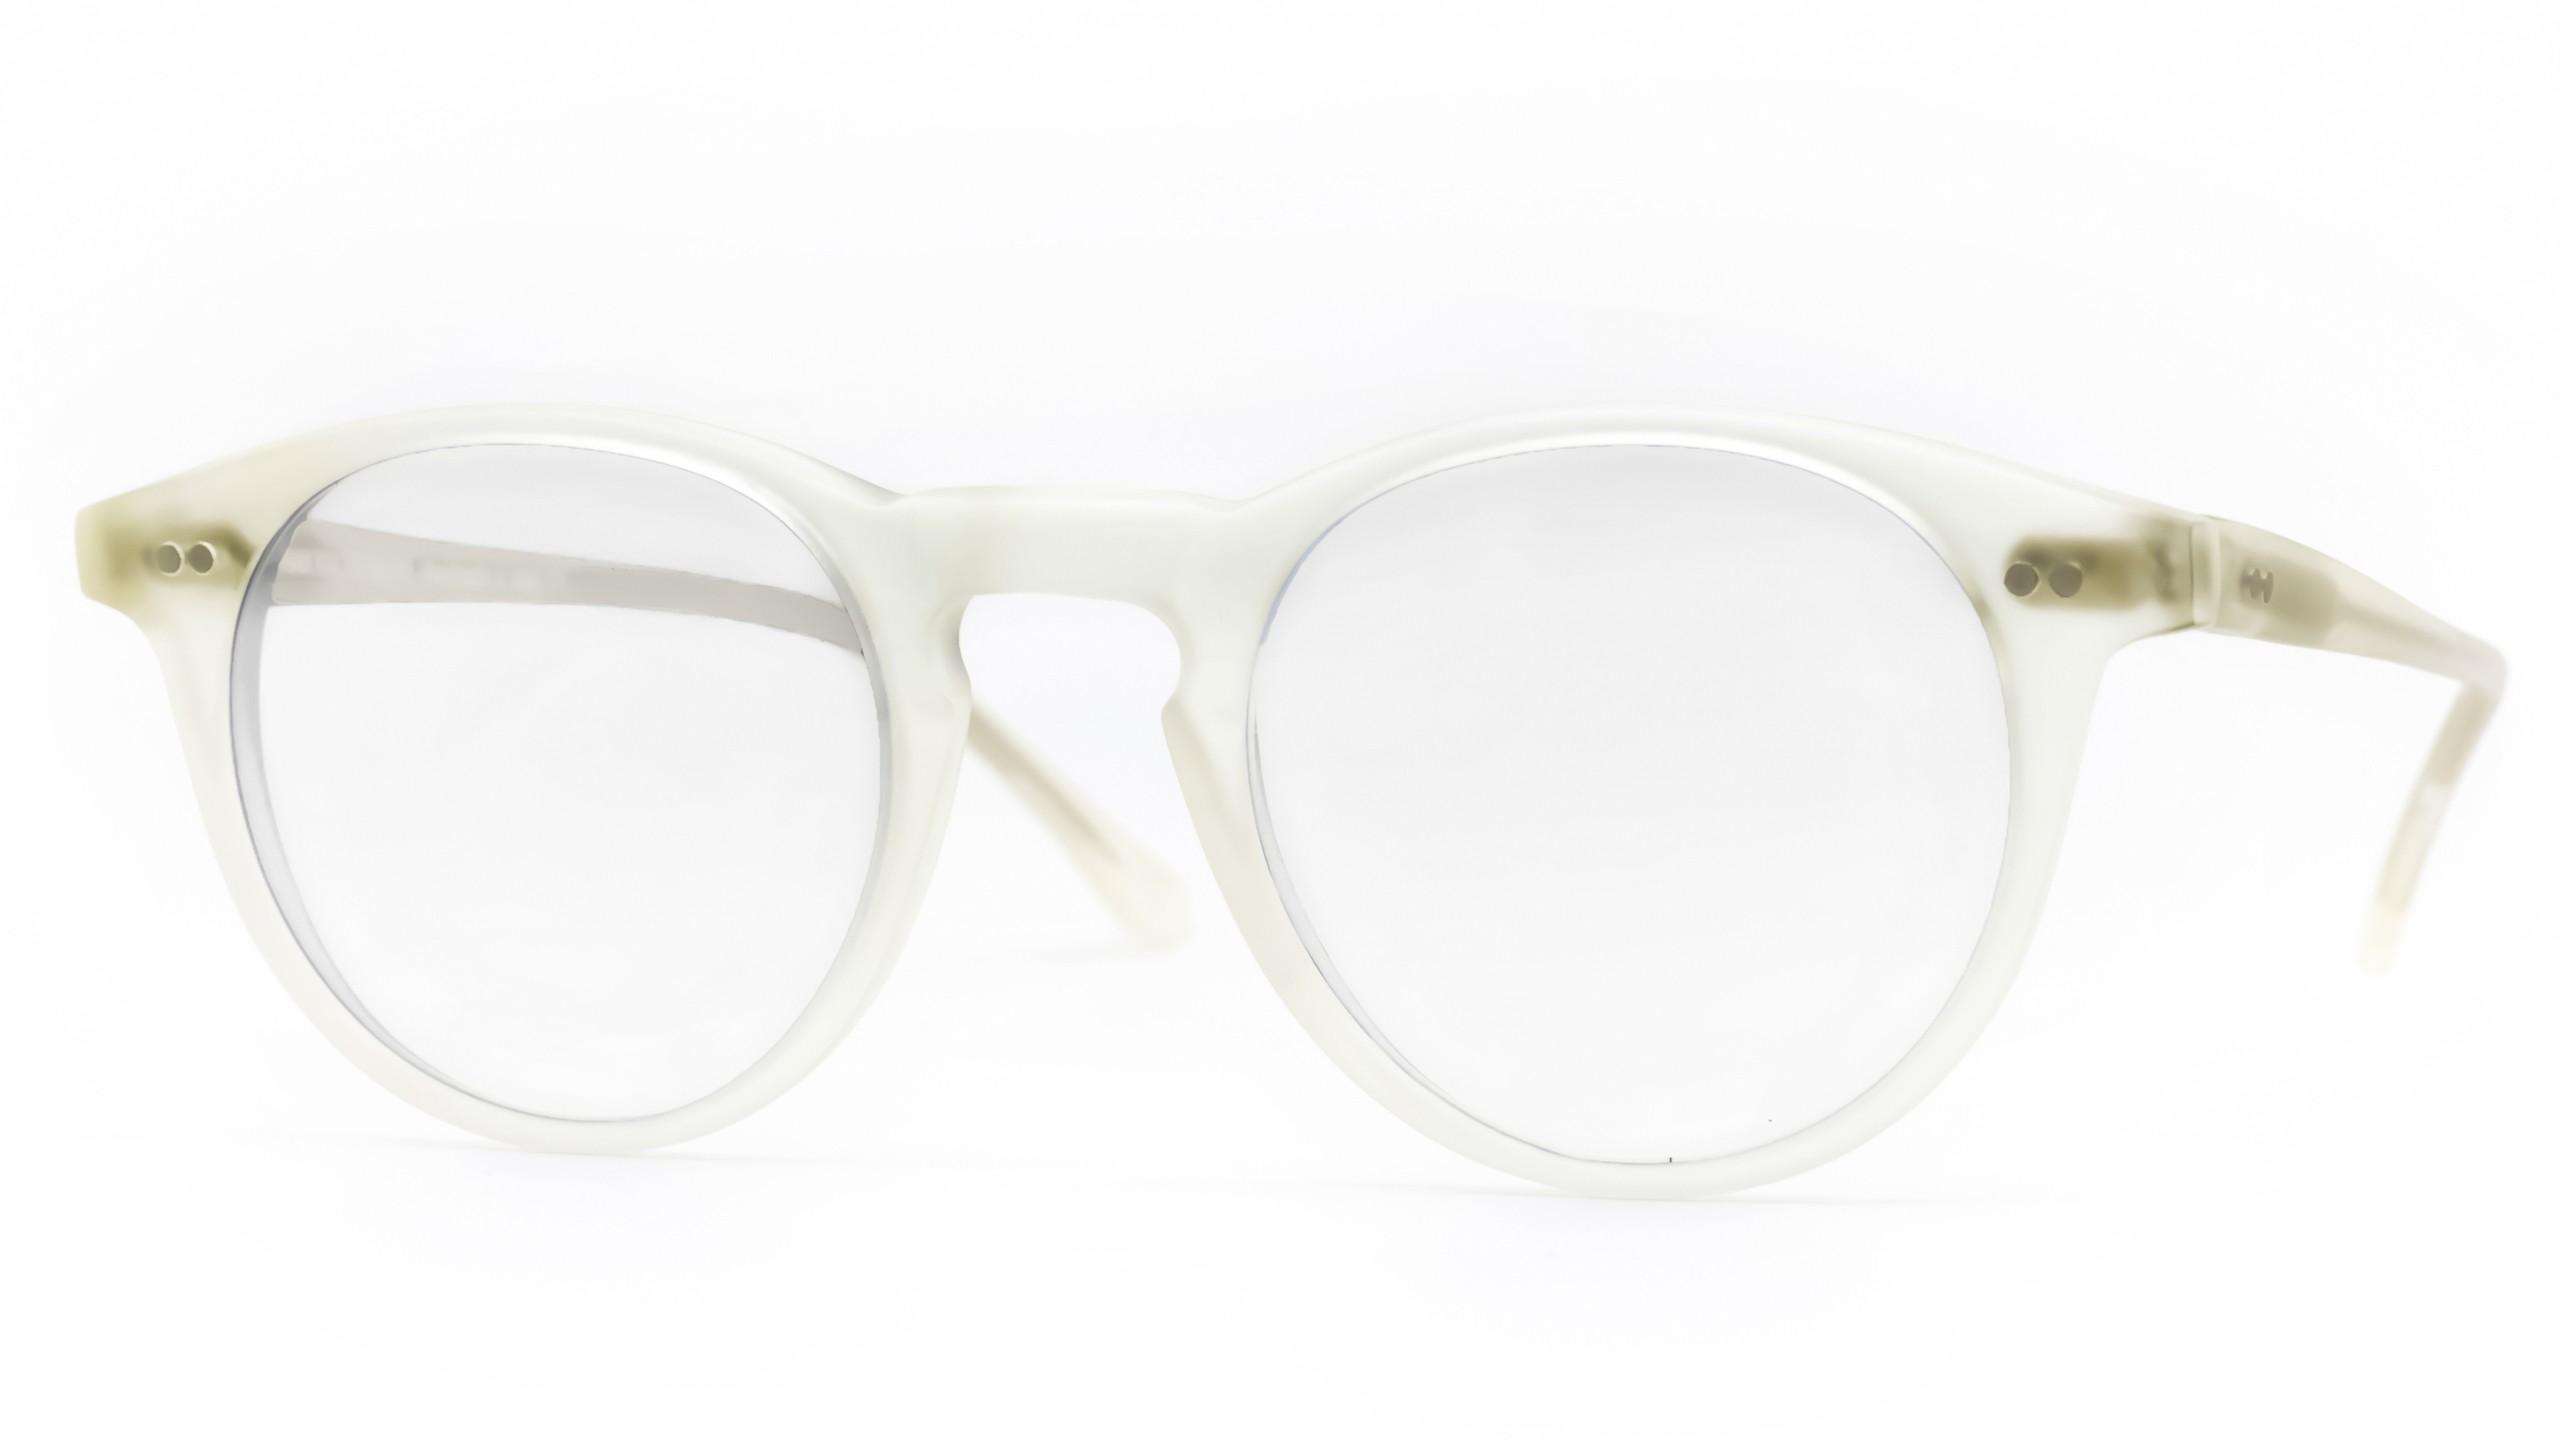 eyeglasses-Nathan-Kaltermann-made-in-Italy-Ponza-C06M-Vista2